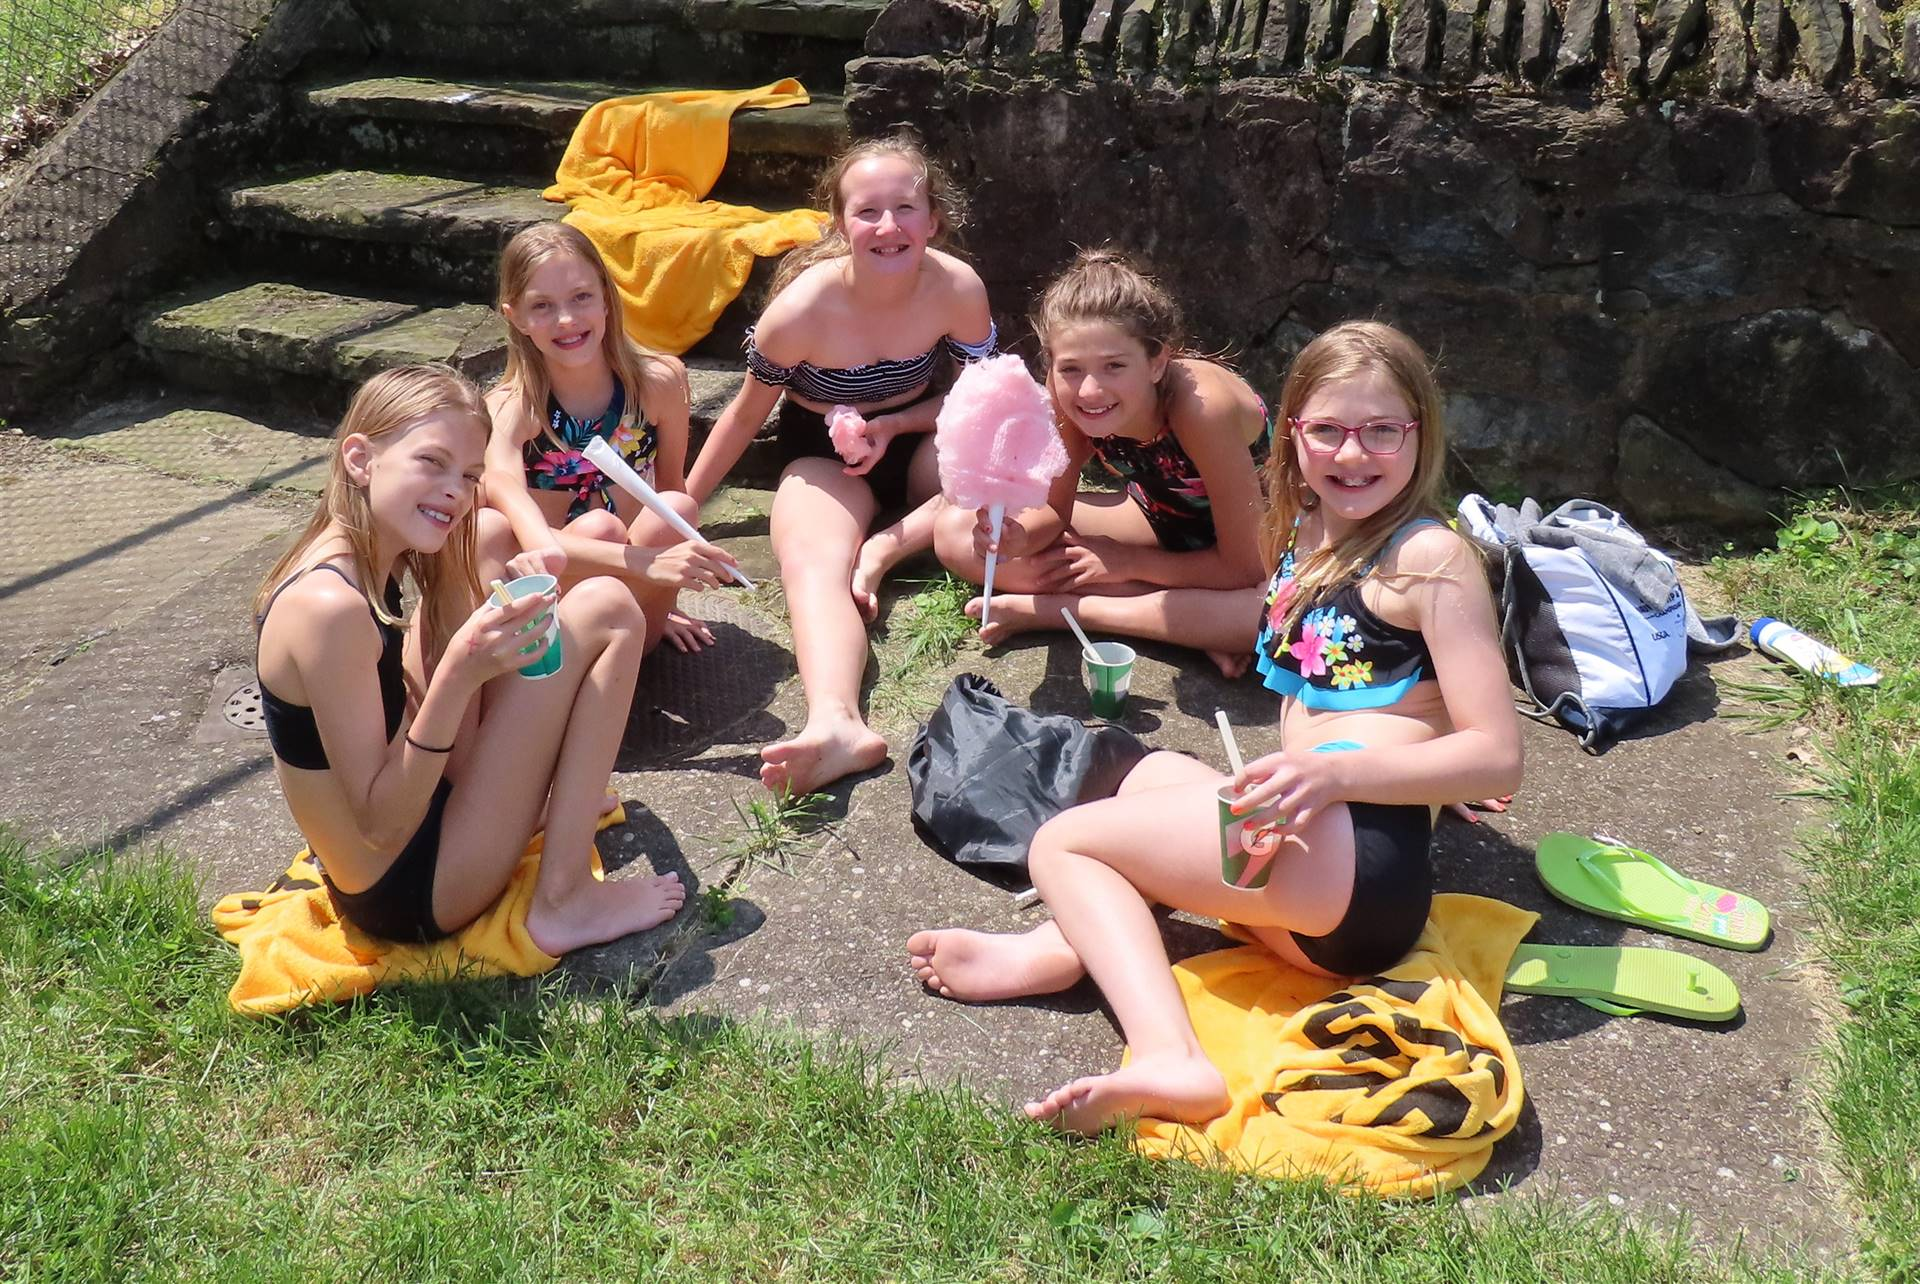 Girls enjoying snacks on beach towels